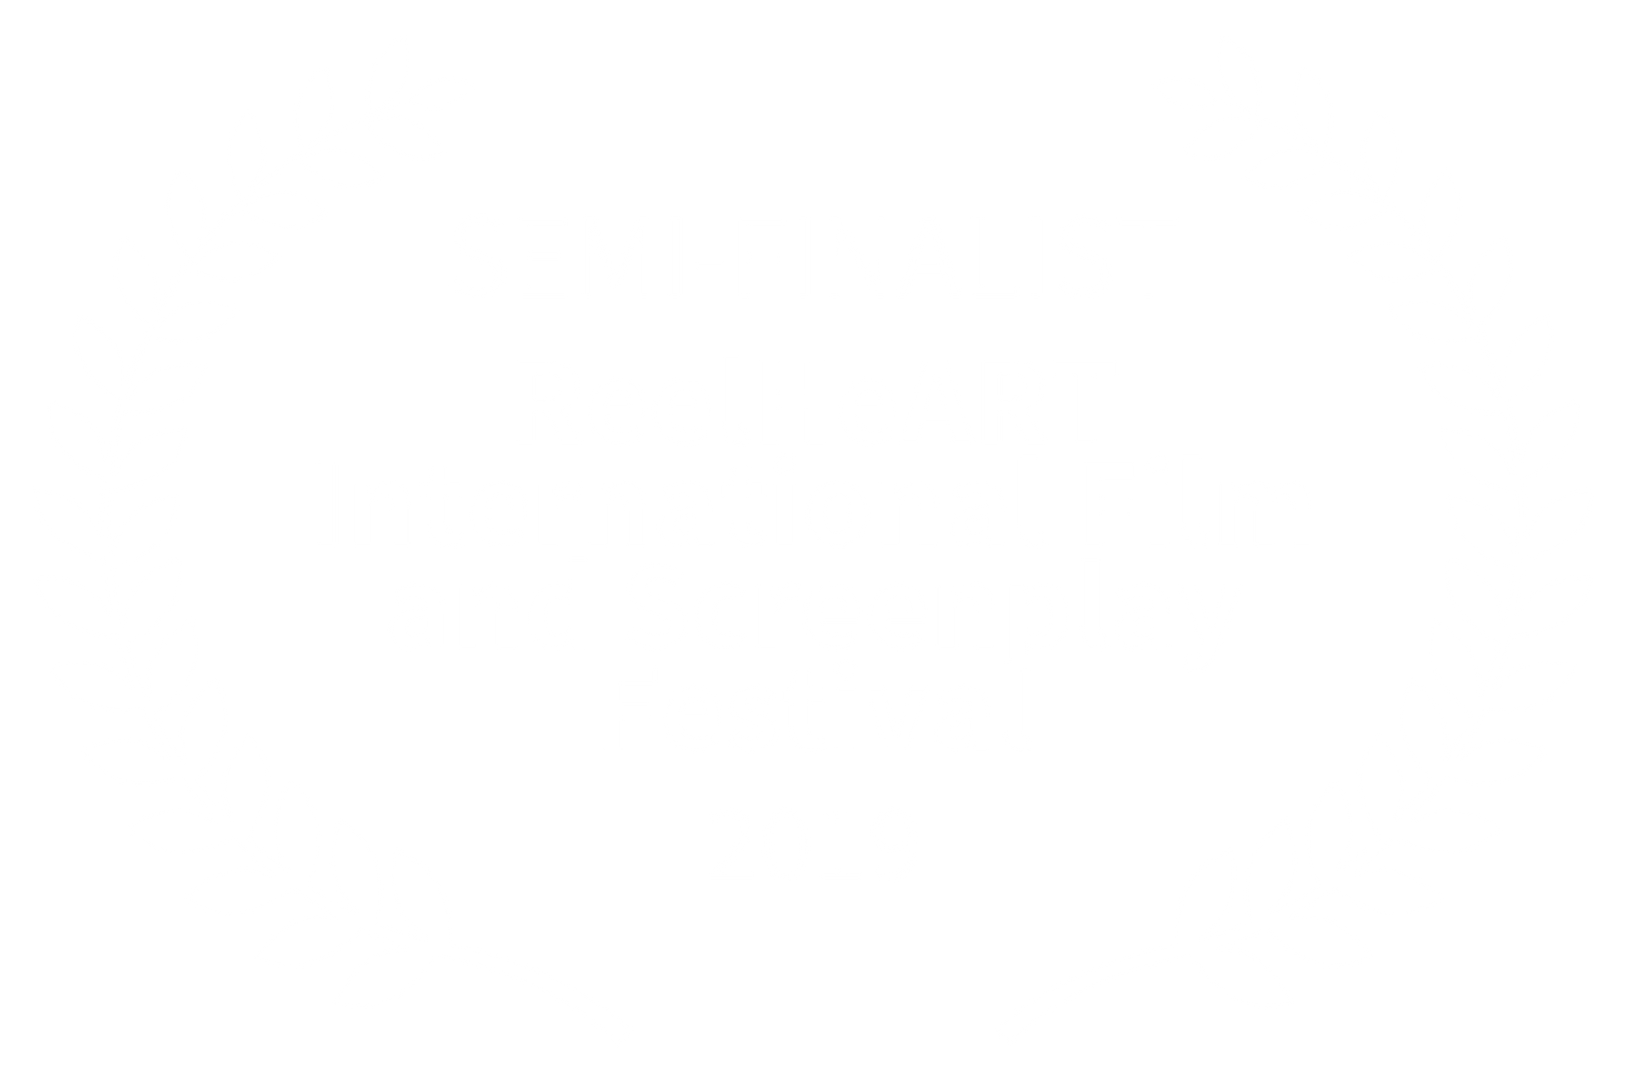 SEMI-FINALIST - ReelHeART International